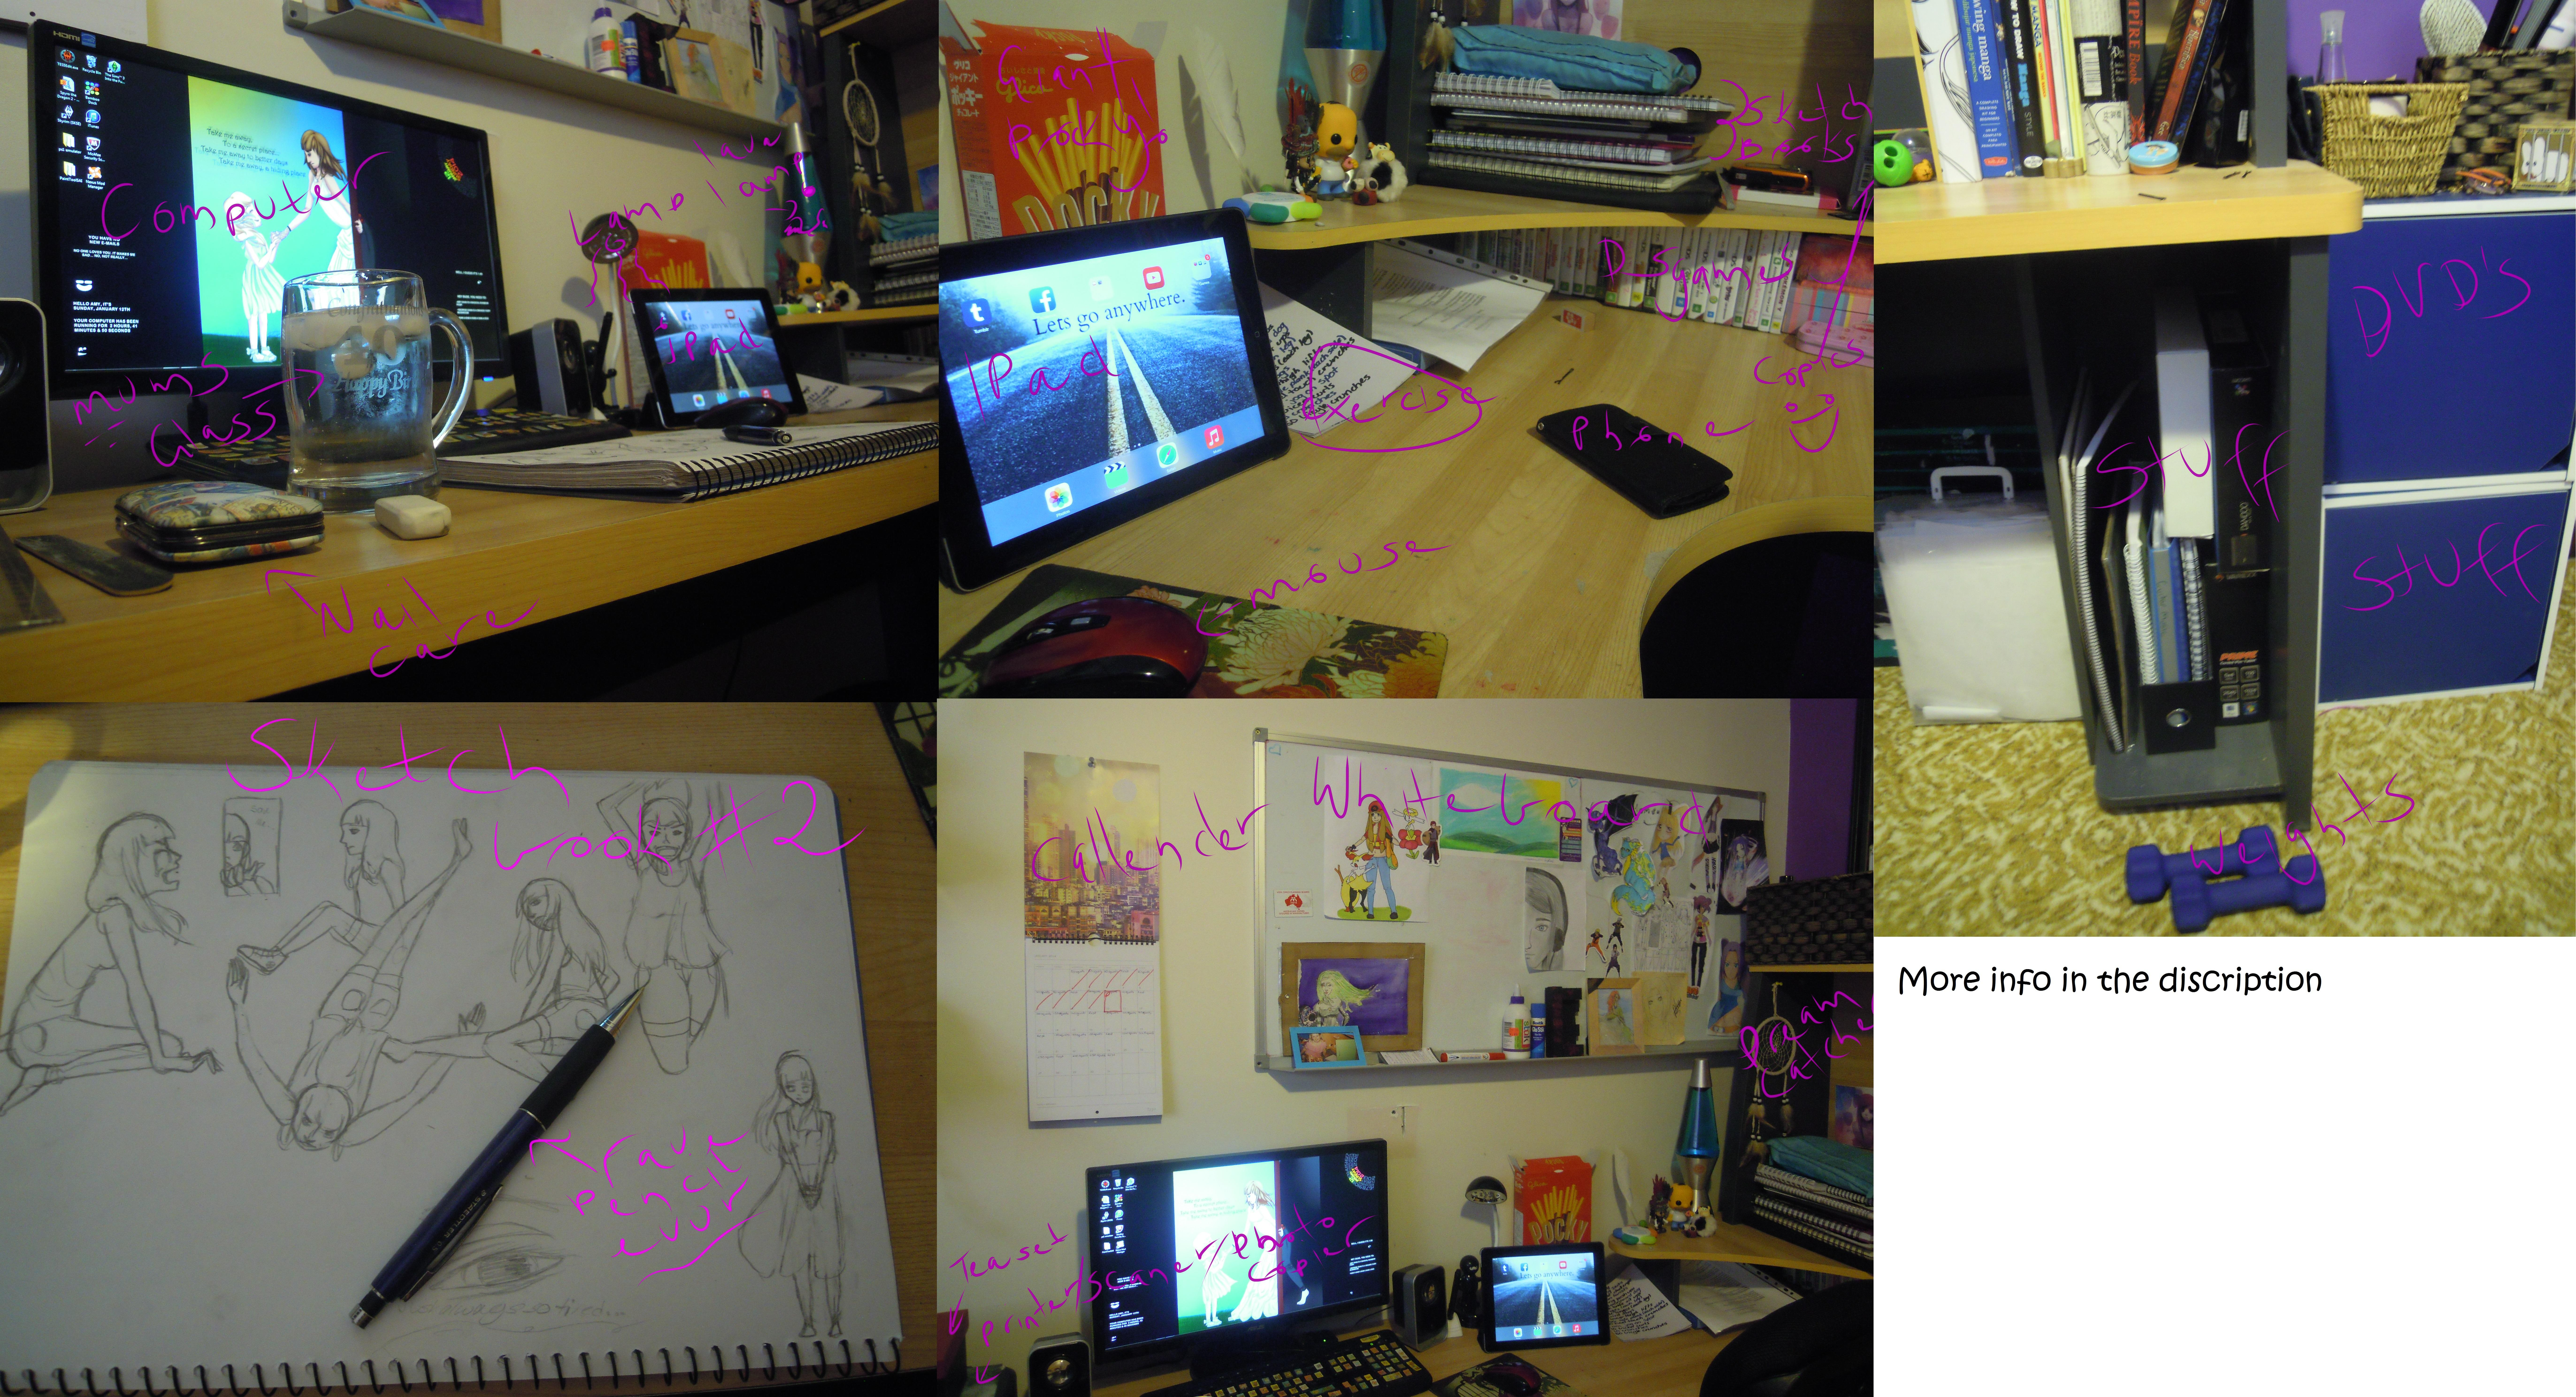 Amys Workspace by LiAR19